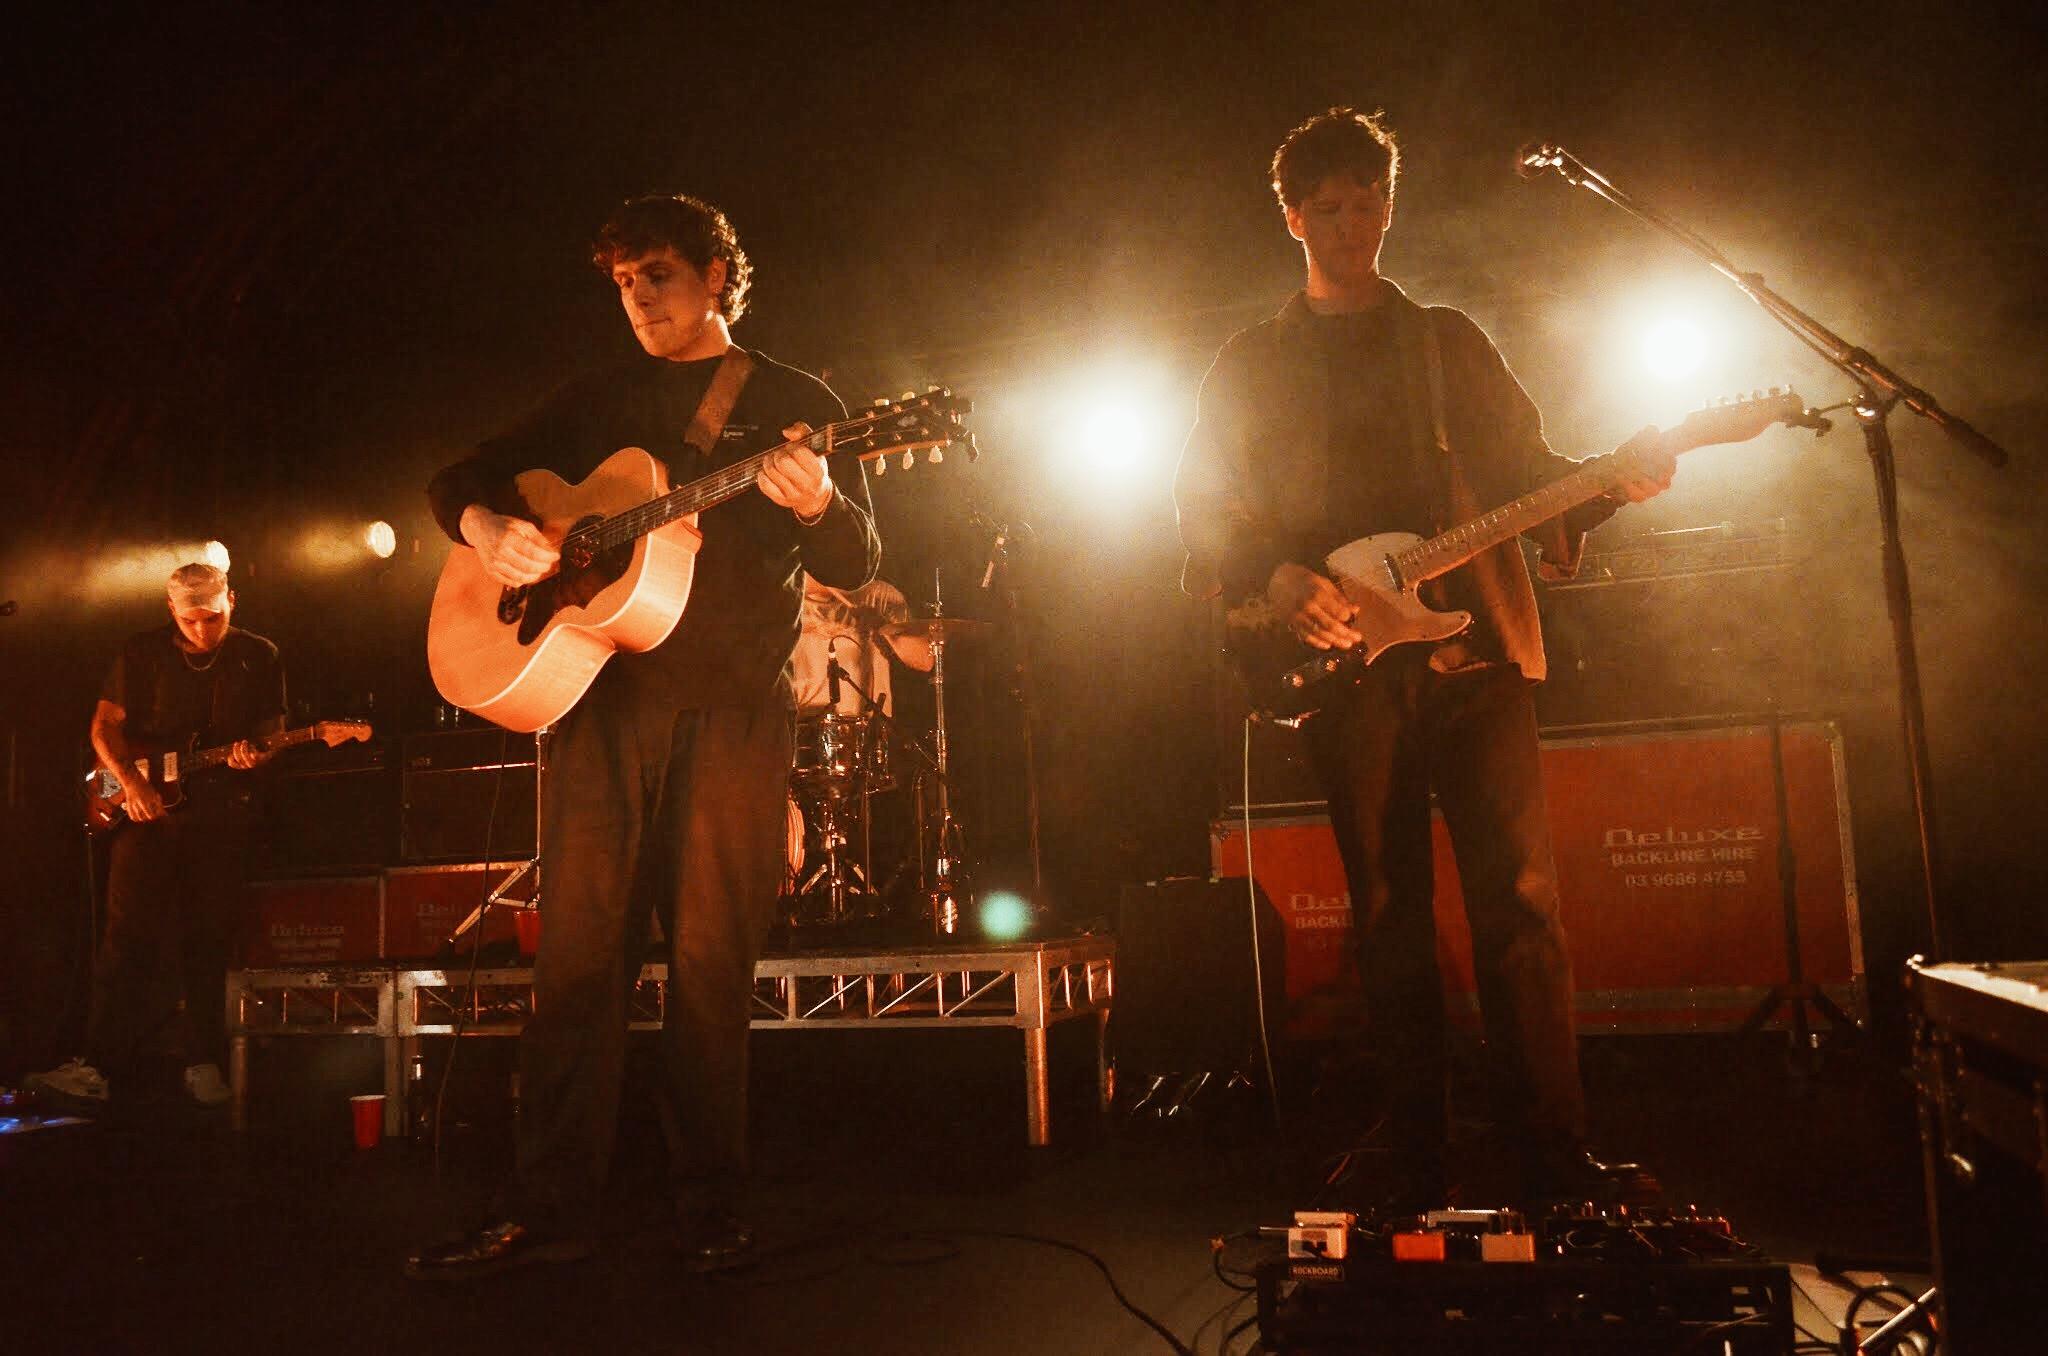 dmas music live review melbourne photo credit ryley clarke savage thrills savagethrills 3